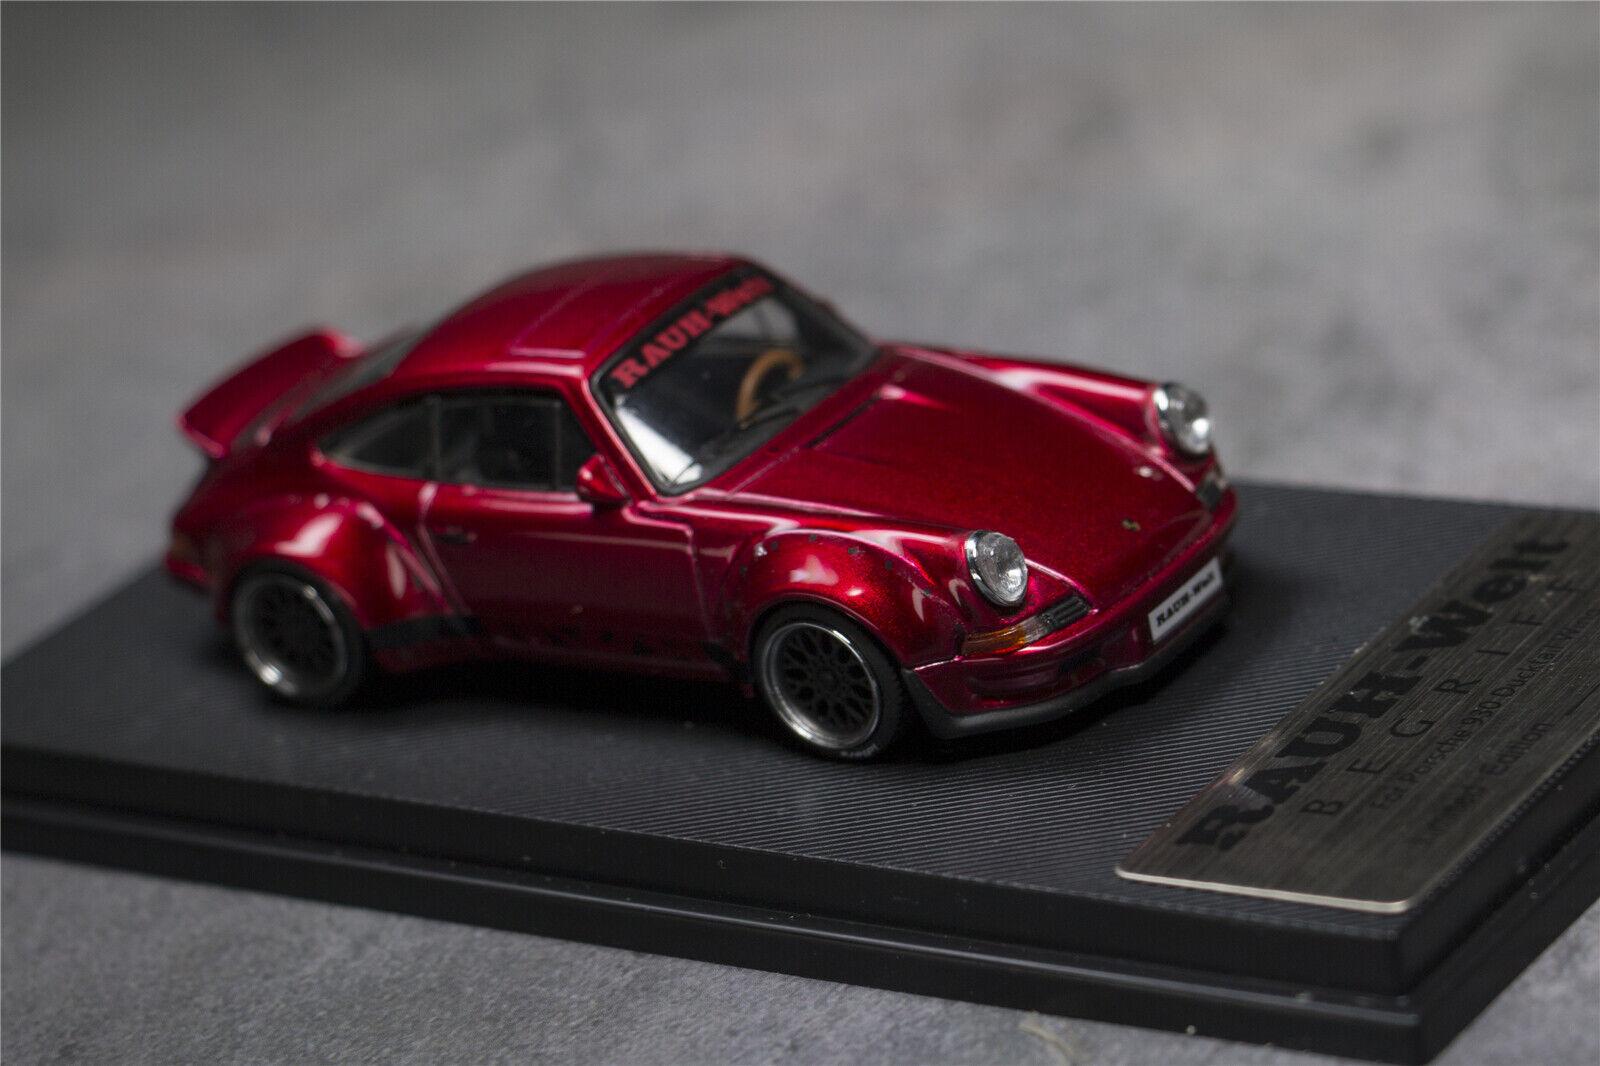 Model Collect 1 64 Porsche 911 930 964 Turbo Rwb Duck Tail Diecast Car Model Red Contemporary Manufacture Toys Hobbies Japengenharia Com Br